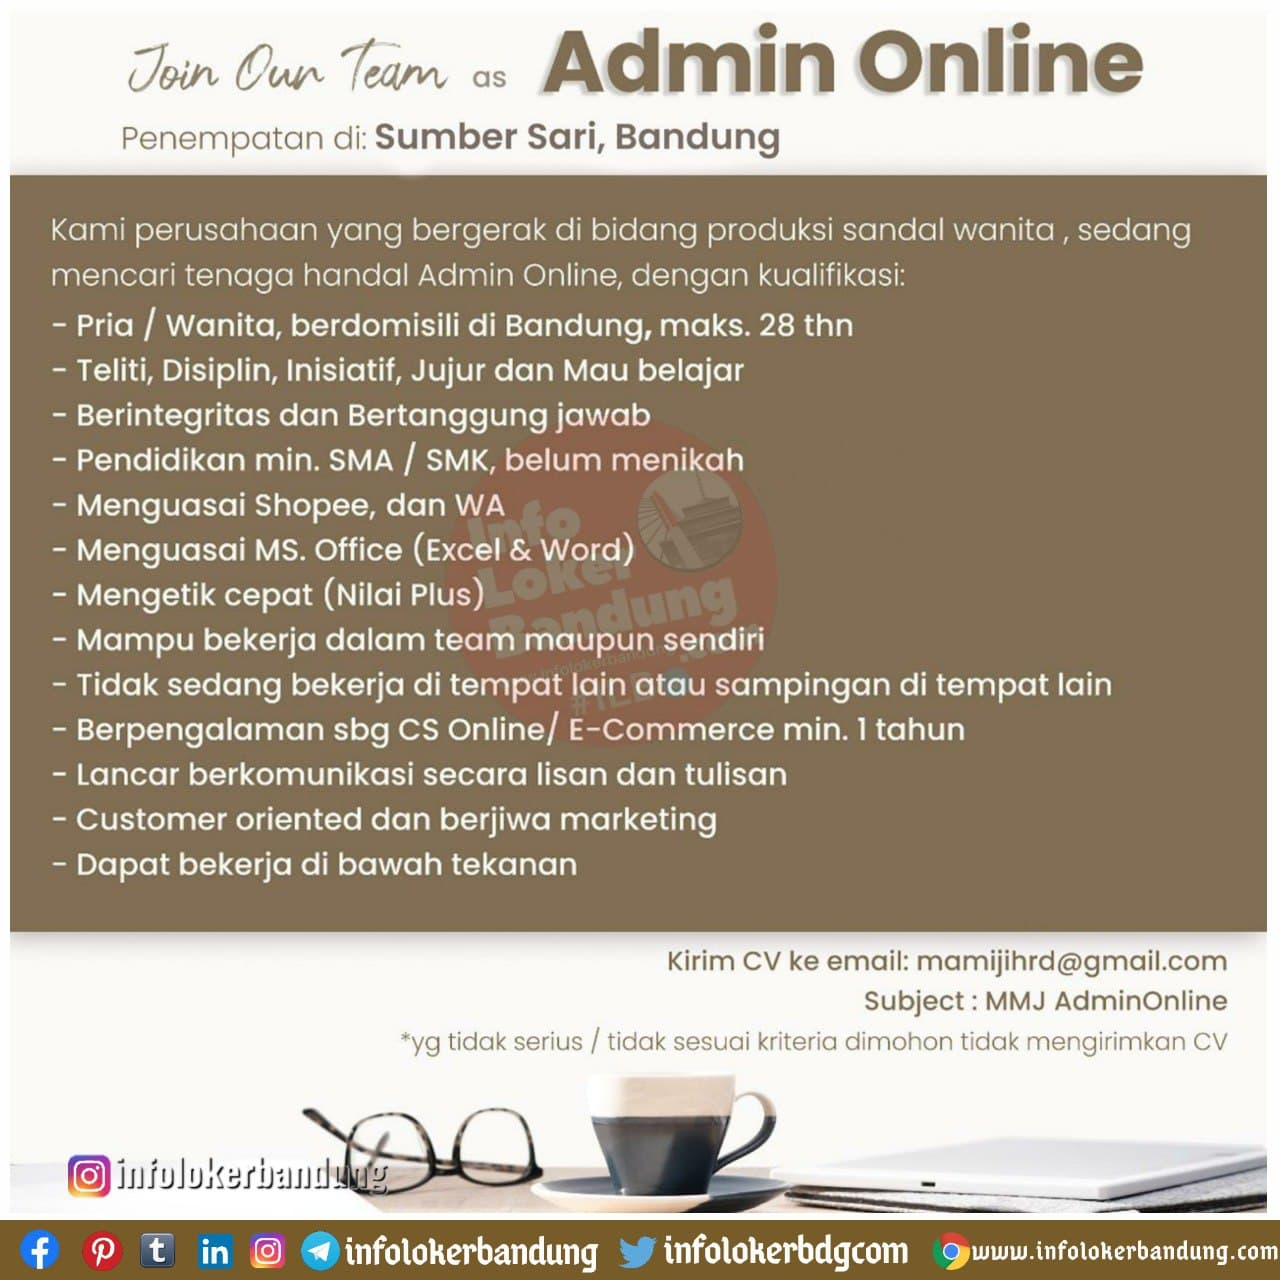 Lowongan Kerja Admin Online Mamiji Bandung Januari 2021